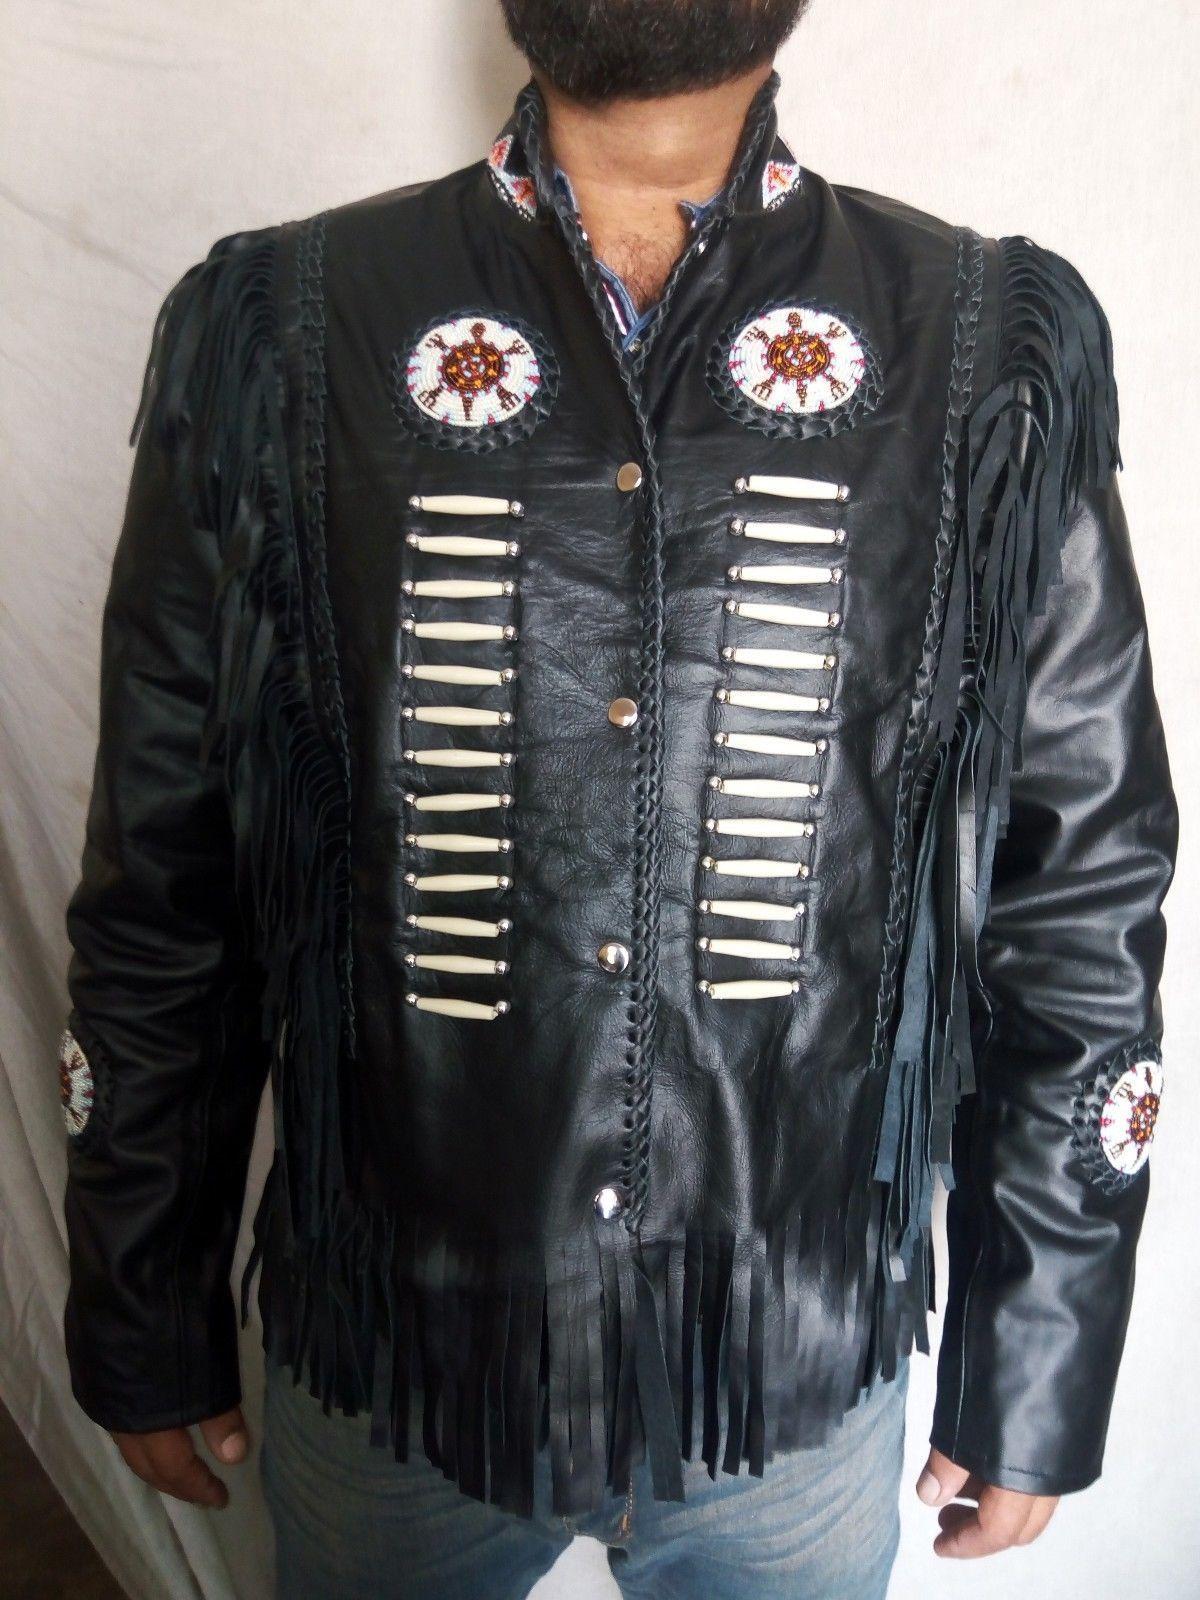 Handmade Western Black Native America Leather Jacket Fringe Beads Bones Jacket Outerwear Kleding Westerns [ 1600 x 1200 Pixel ]